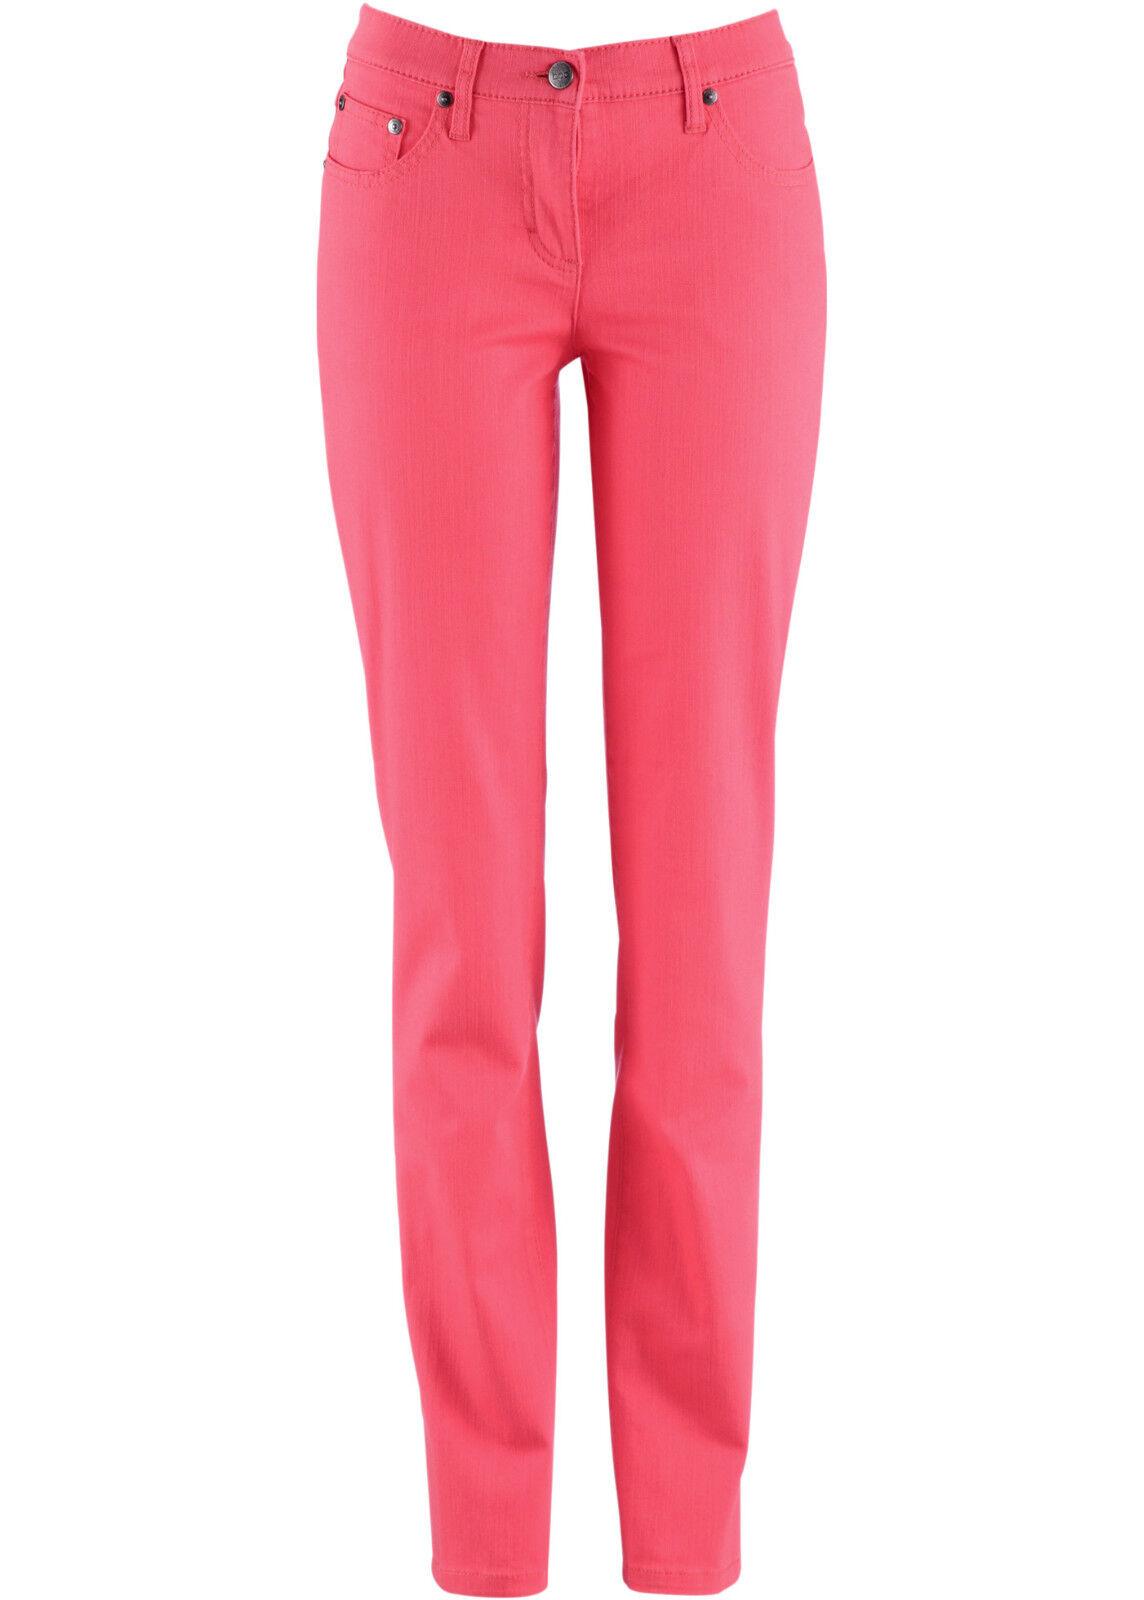 BPC Damen Stretchhose Lycra-Hose Jeans Chino Stretch kieselgrau 966430